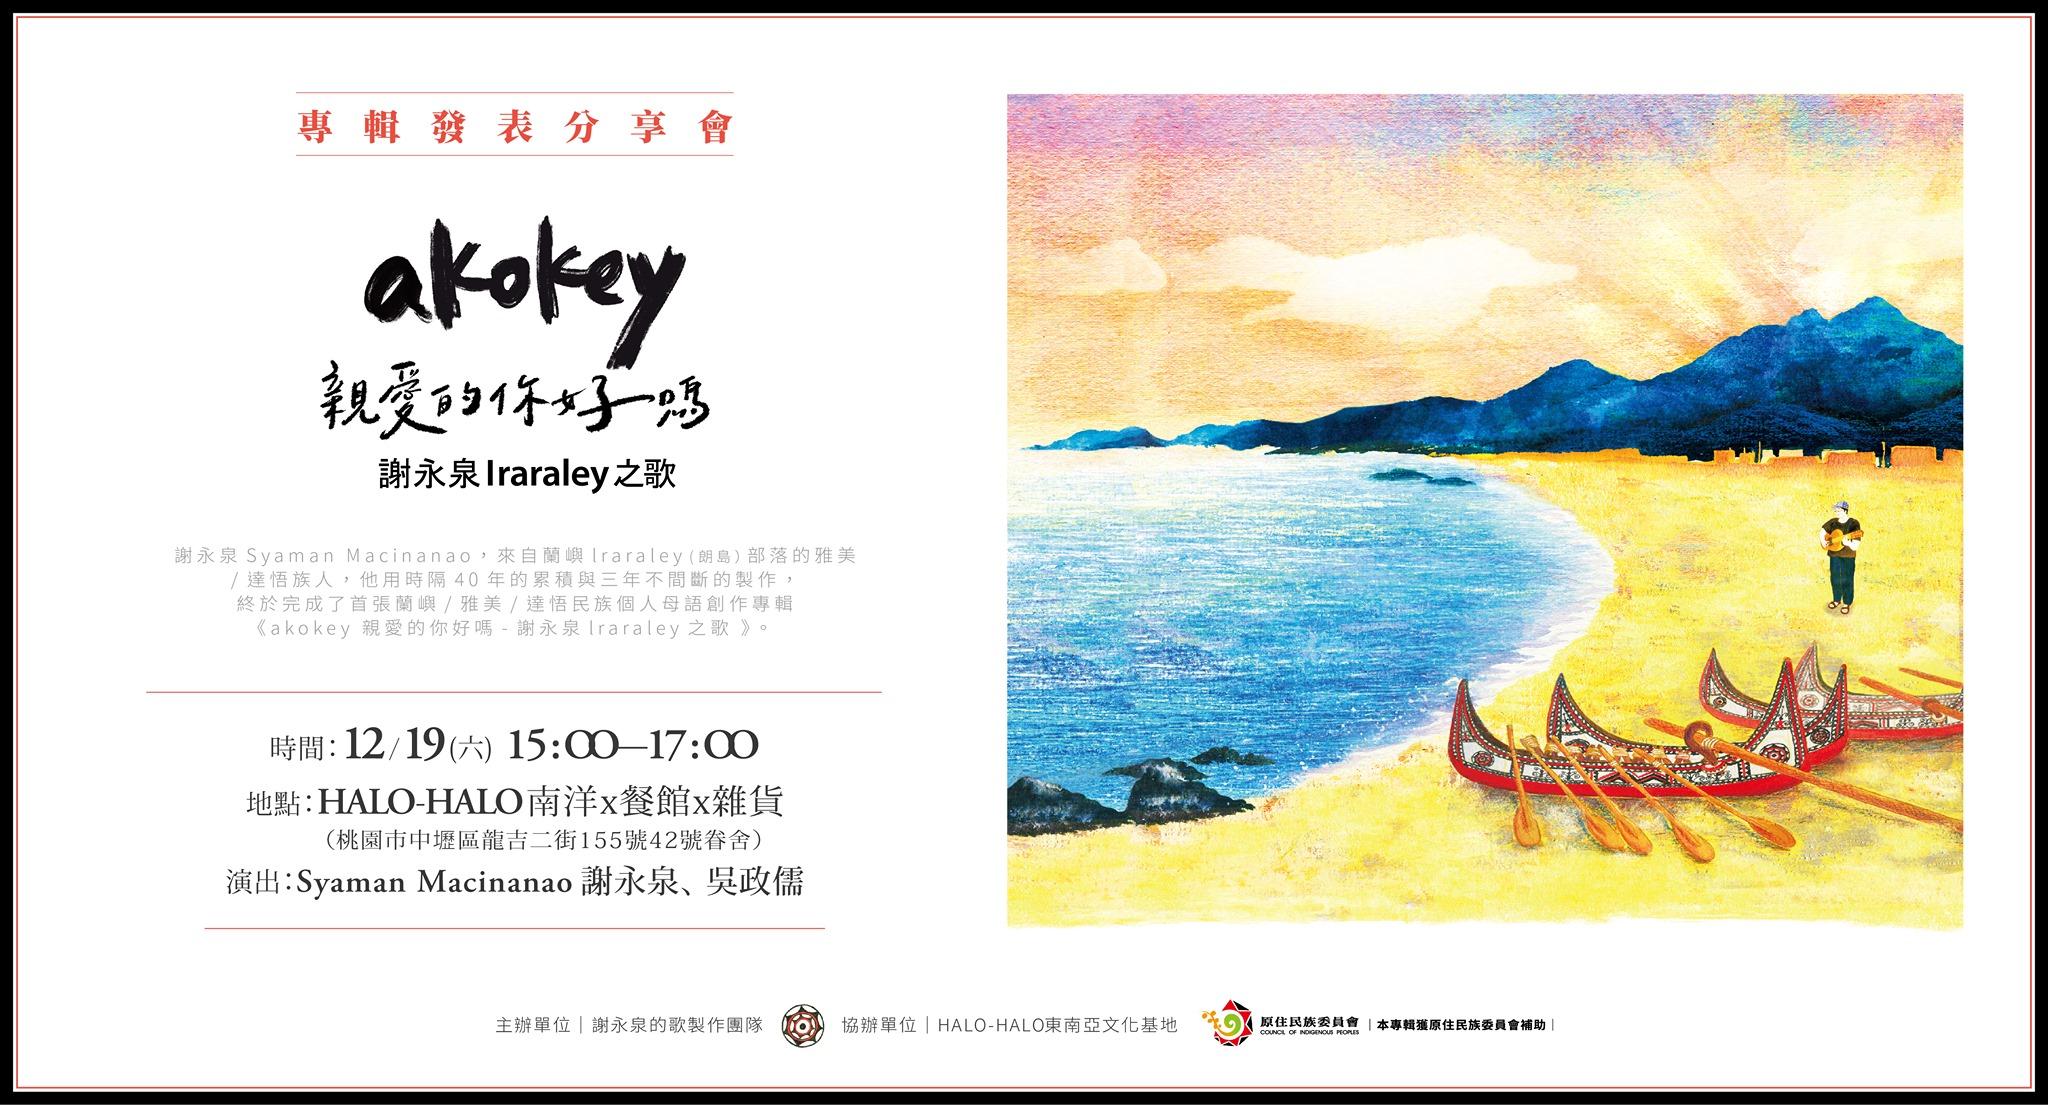 《akokey 親愛的你好嗎 謝永泉lraraley之歌 》專輯發表分享會